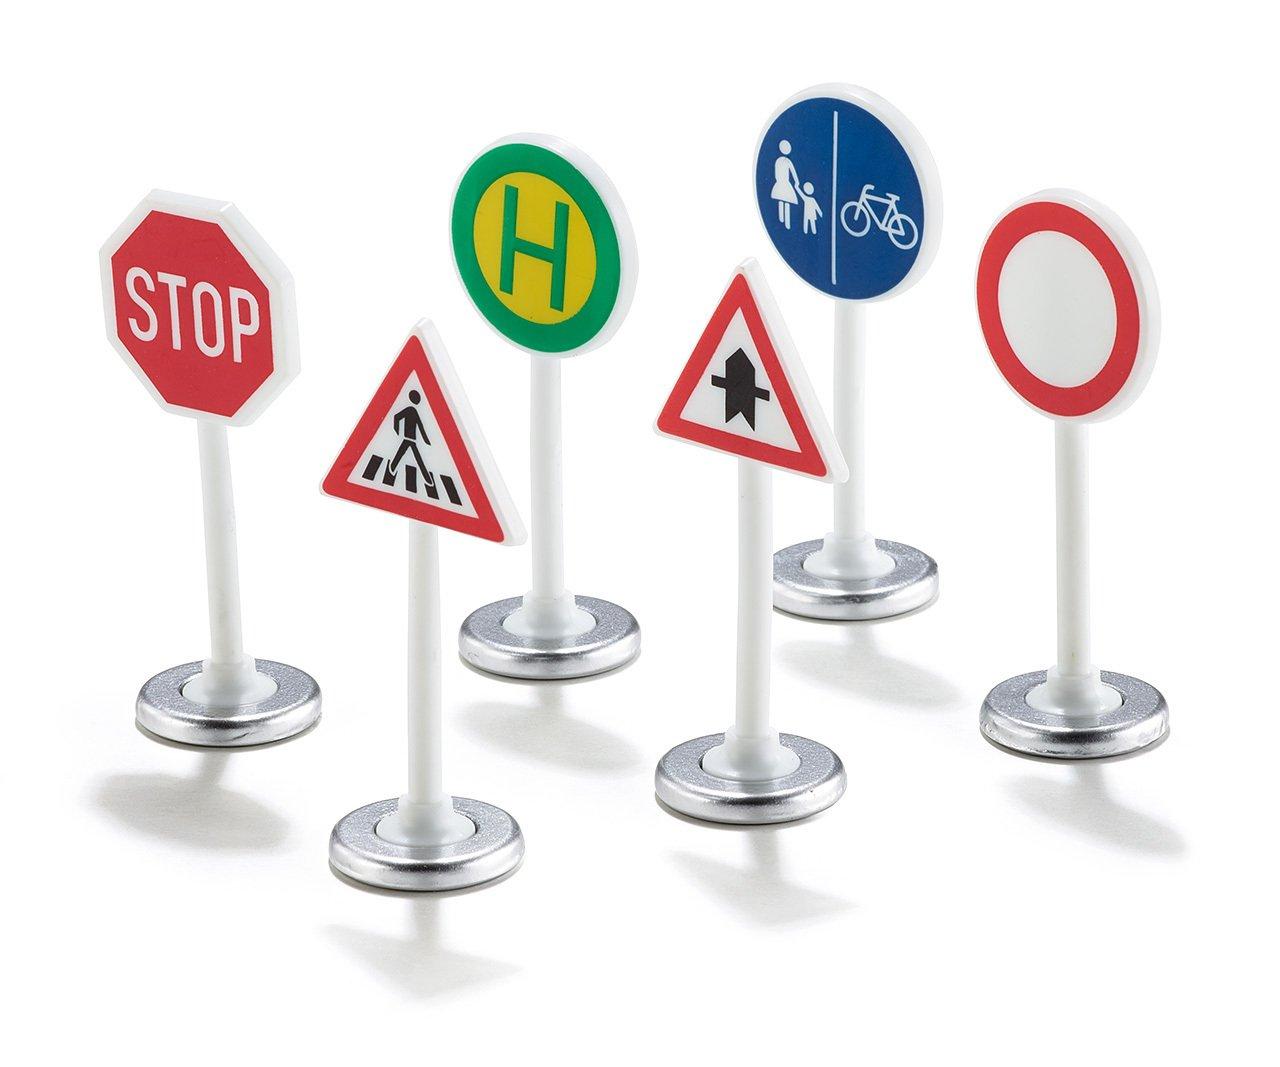 Signaux routiers - Siku - Modèle 857